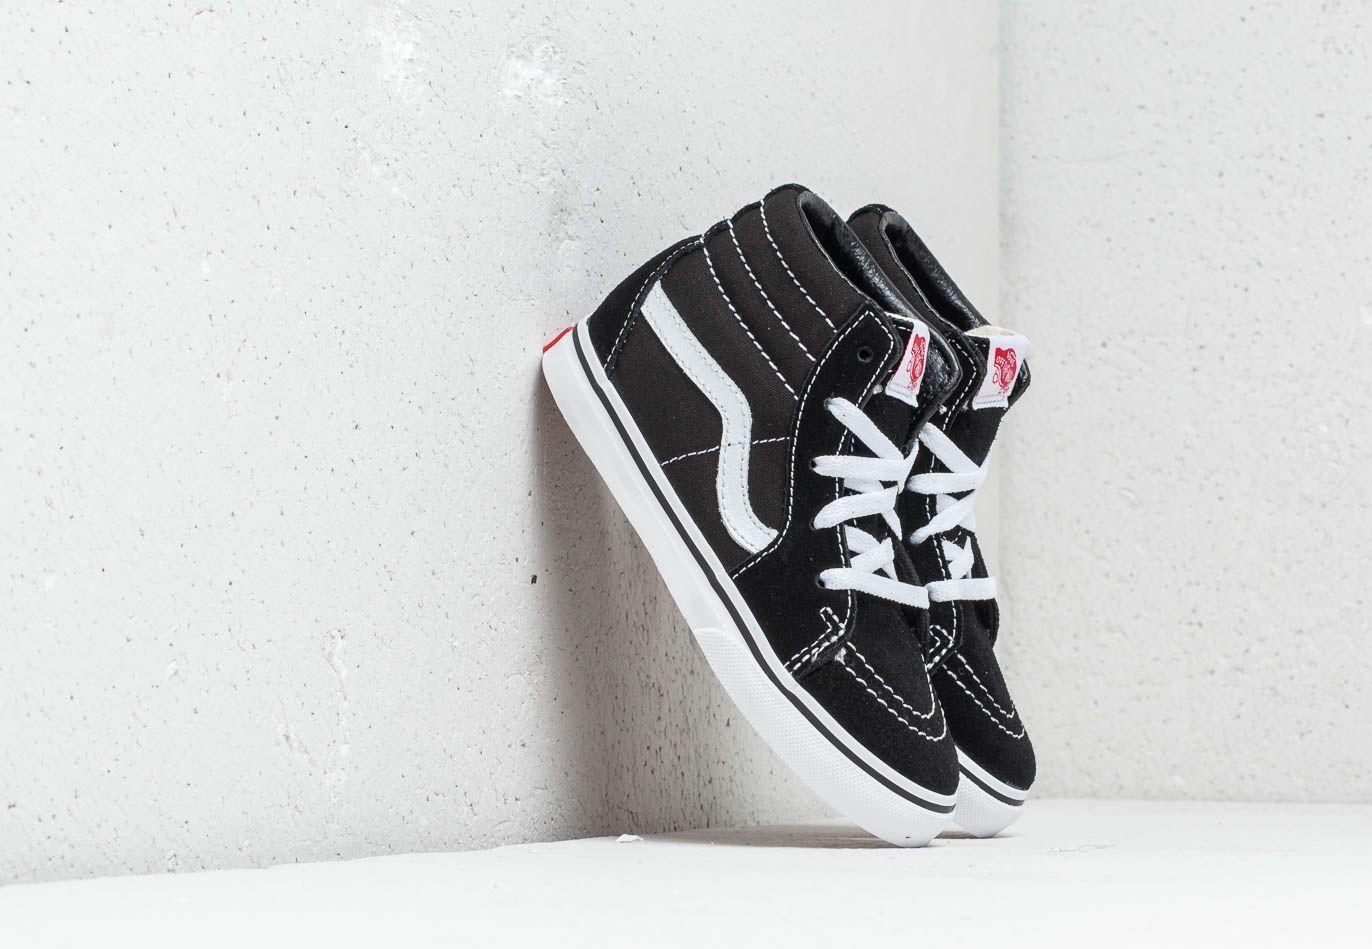 Vans Toddler SK8-Hi Black/ True White EUR 26.5